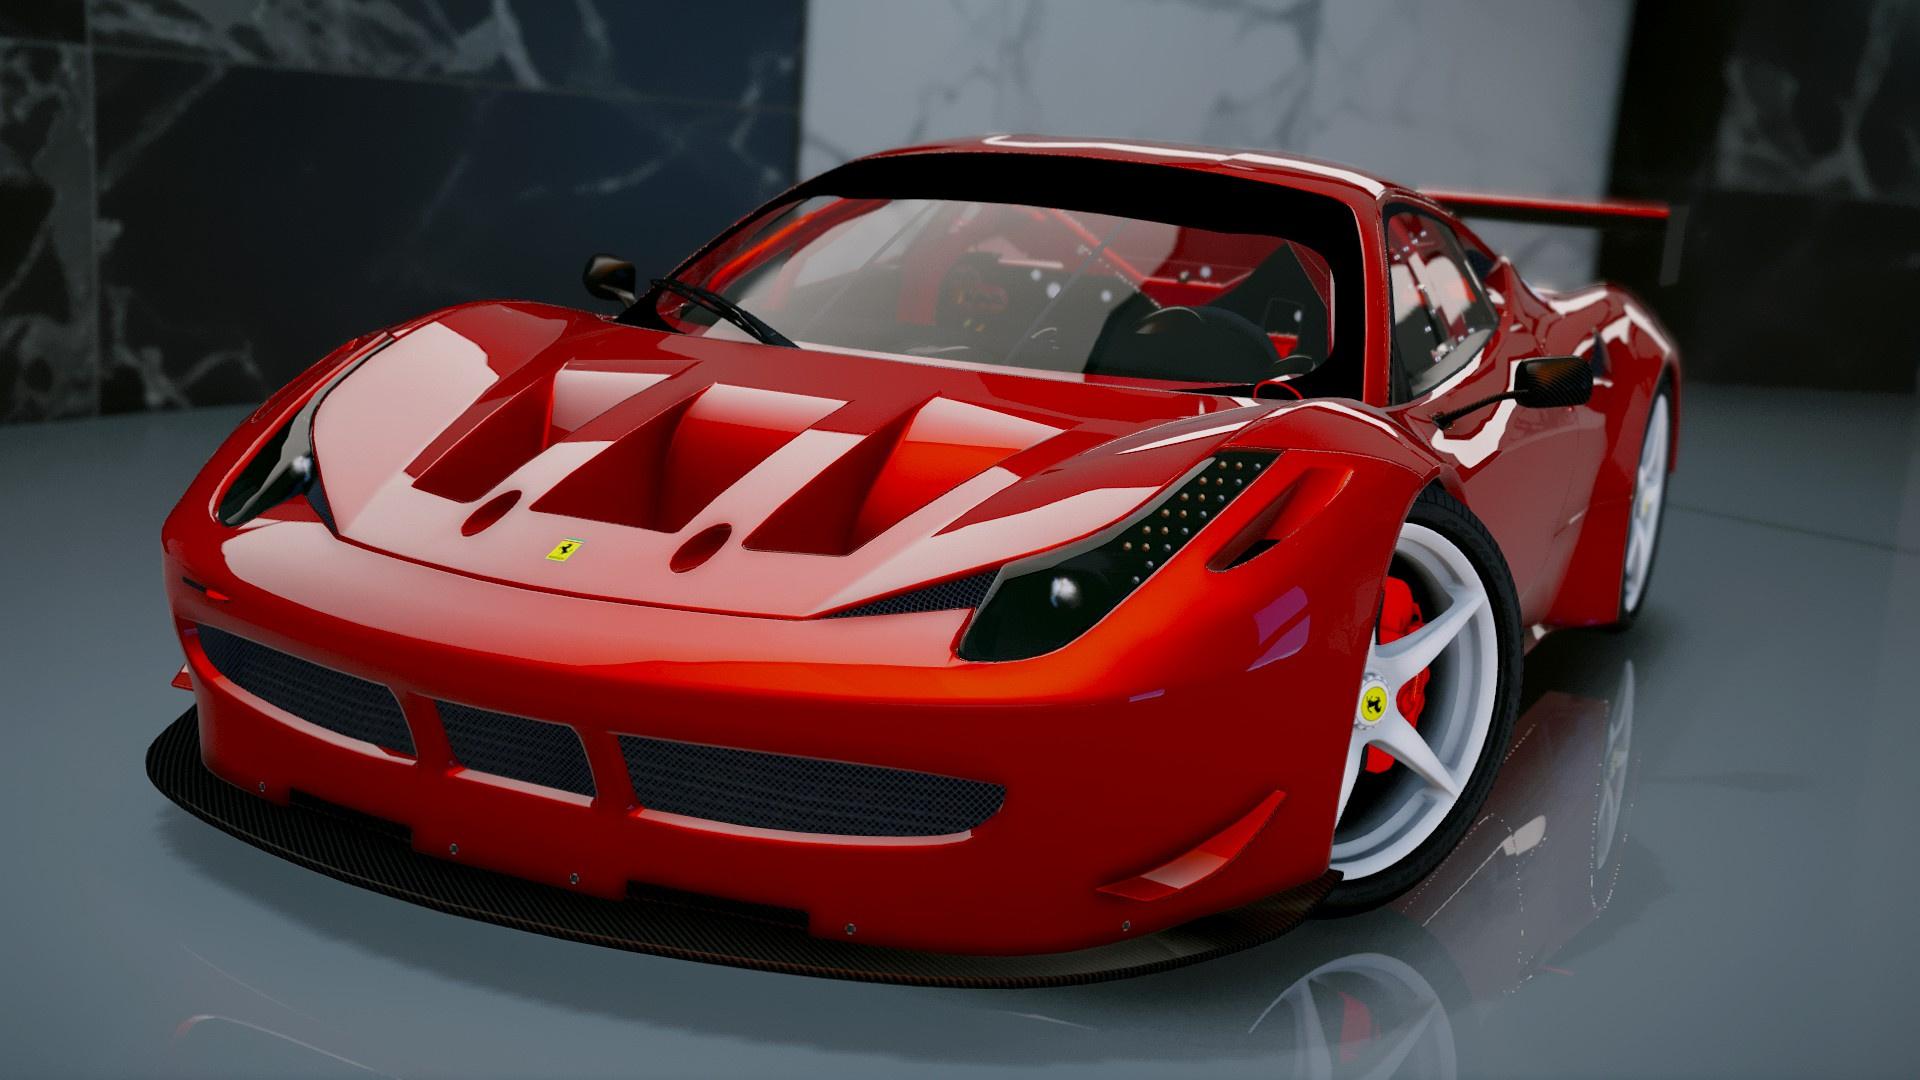 Ferrari 458 Italia Gt2 Add On Tuning Gta5 Mods Com